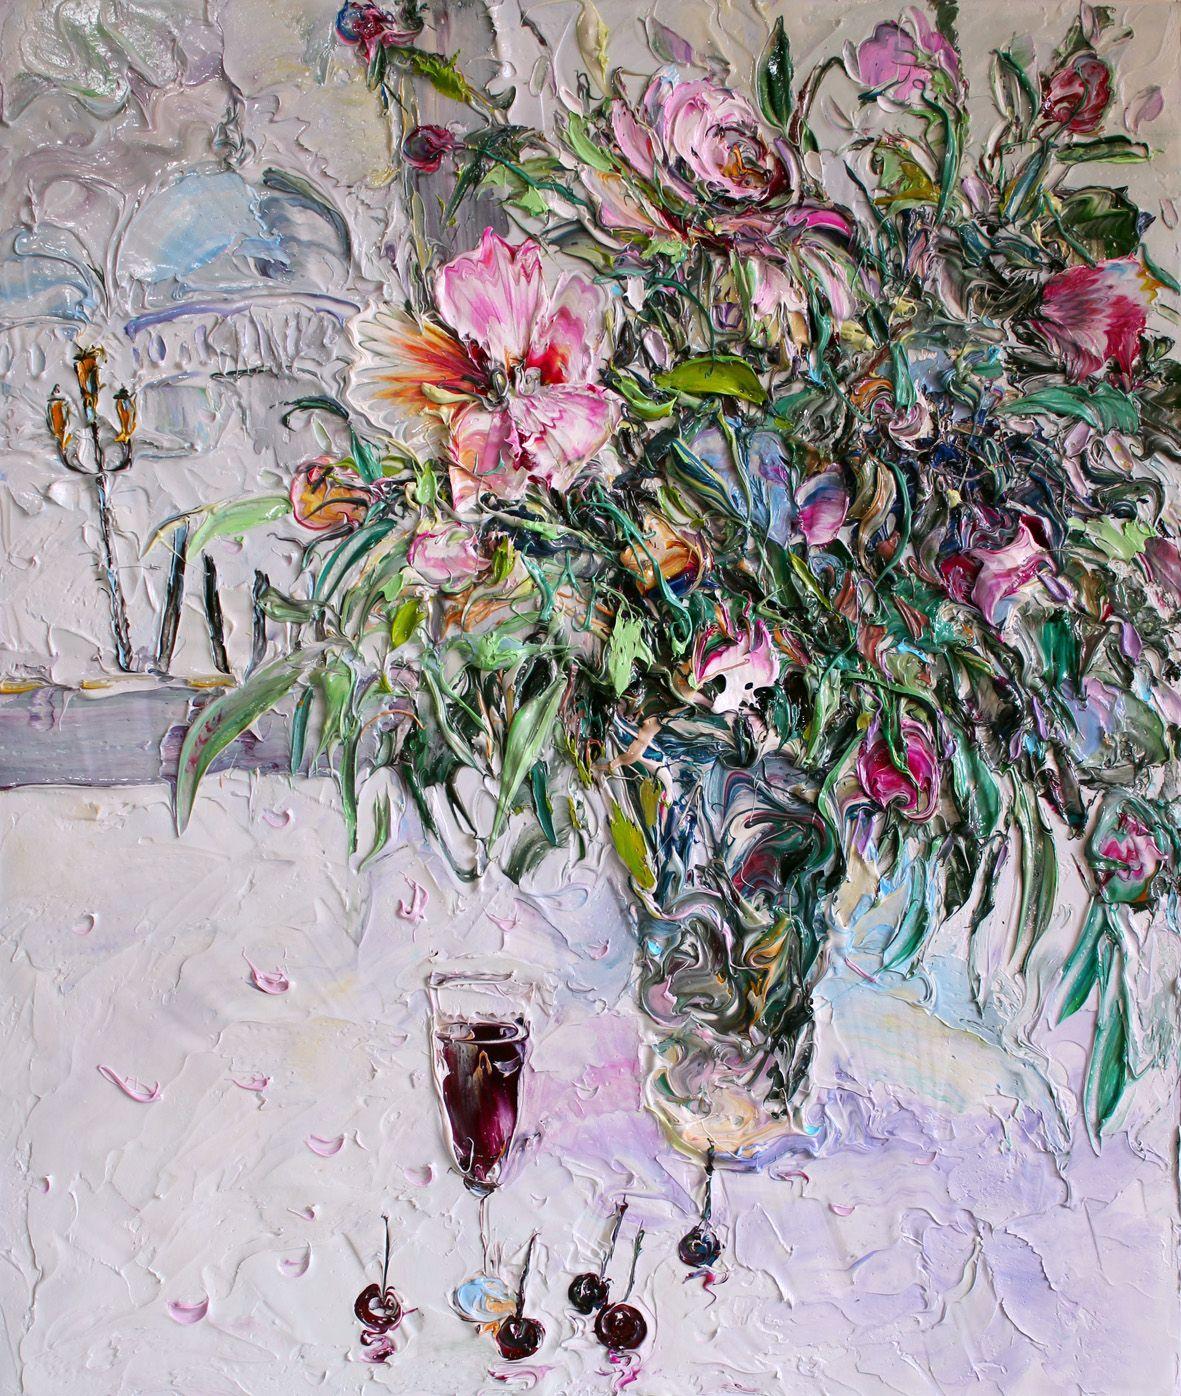 Last day in Venice, Yuriy Grebenyuk, Oil on canvas, 65*55 cm, 26